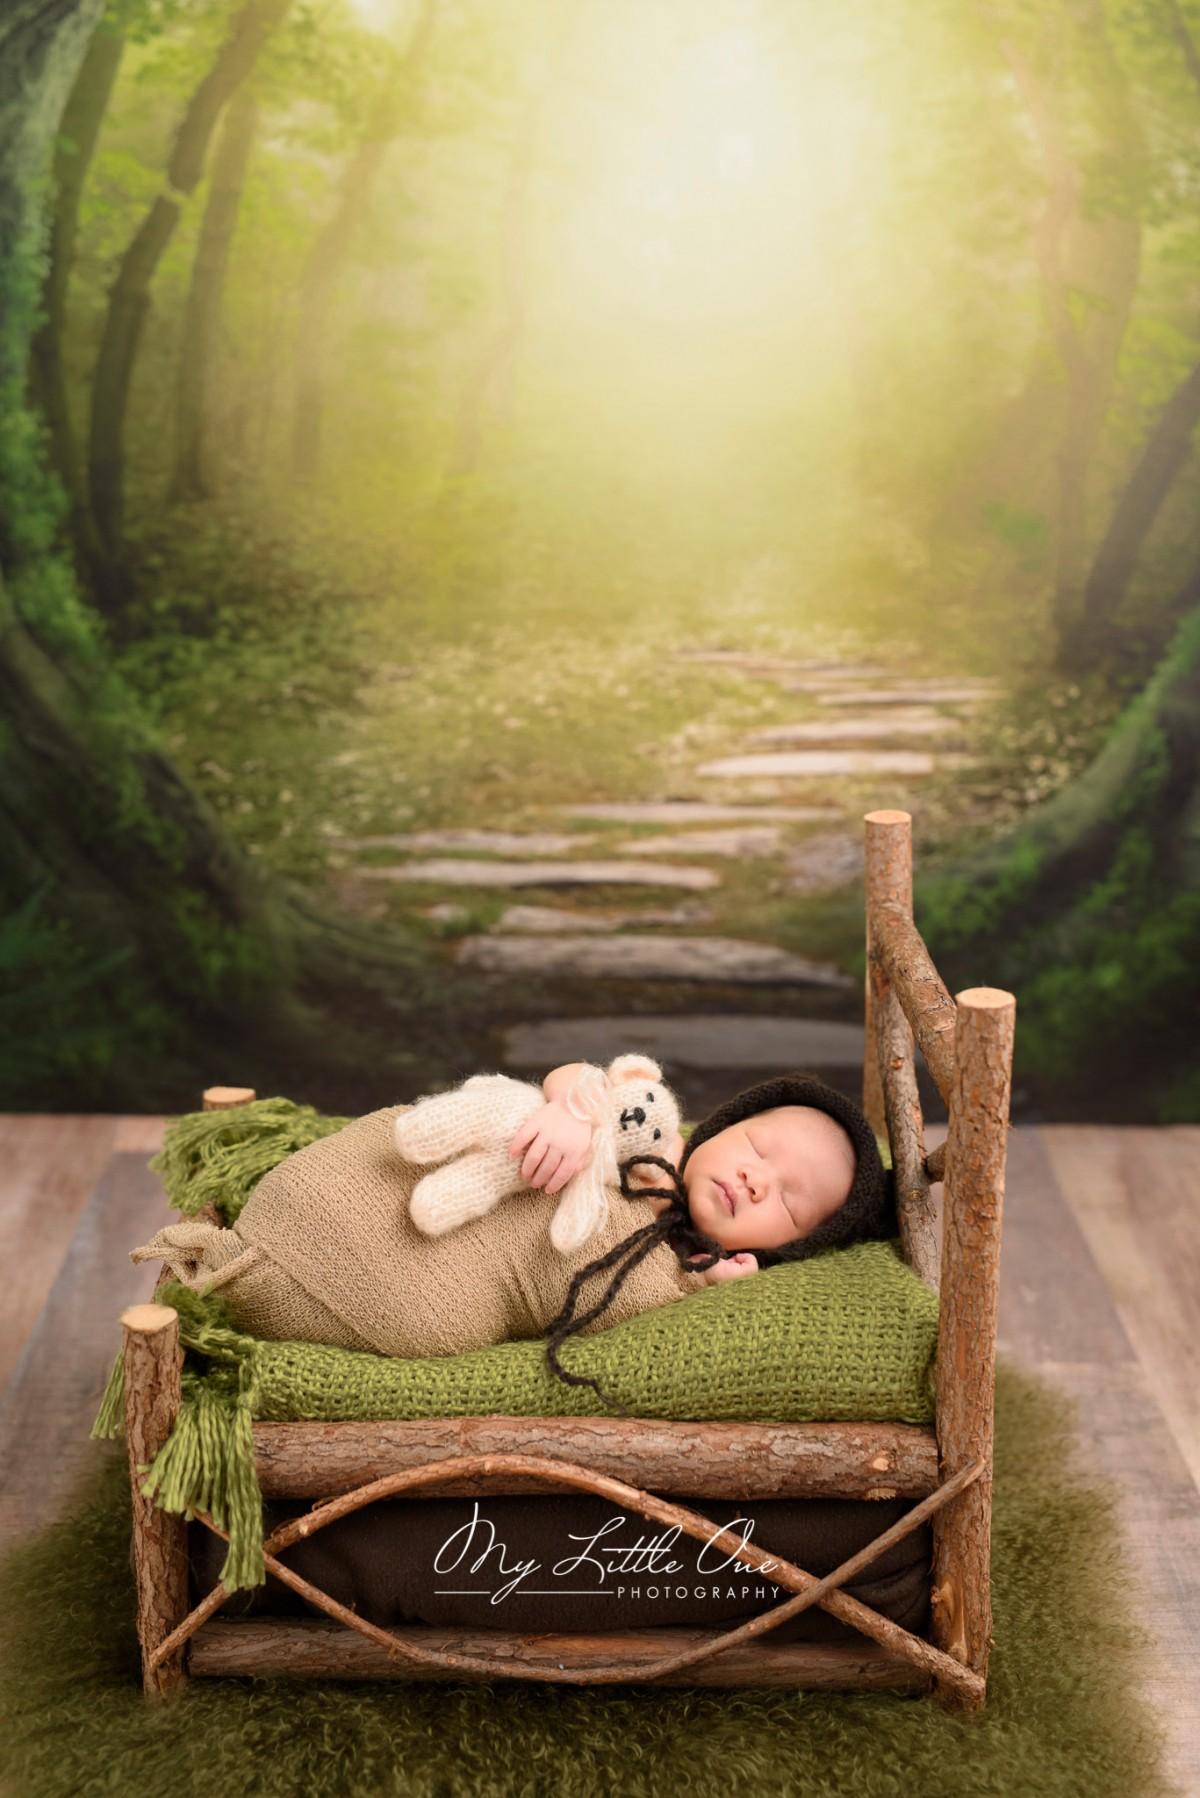 Sydney-Newborn-Photo-Joshua-52